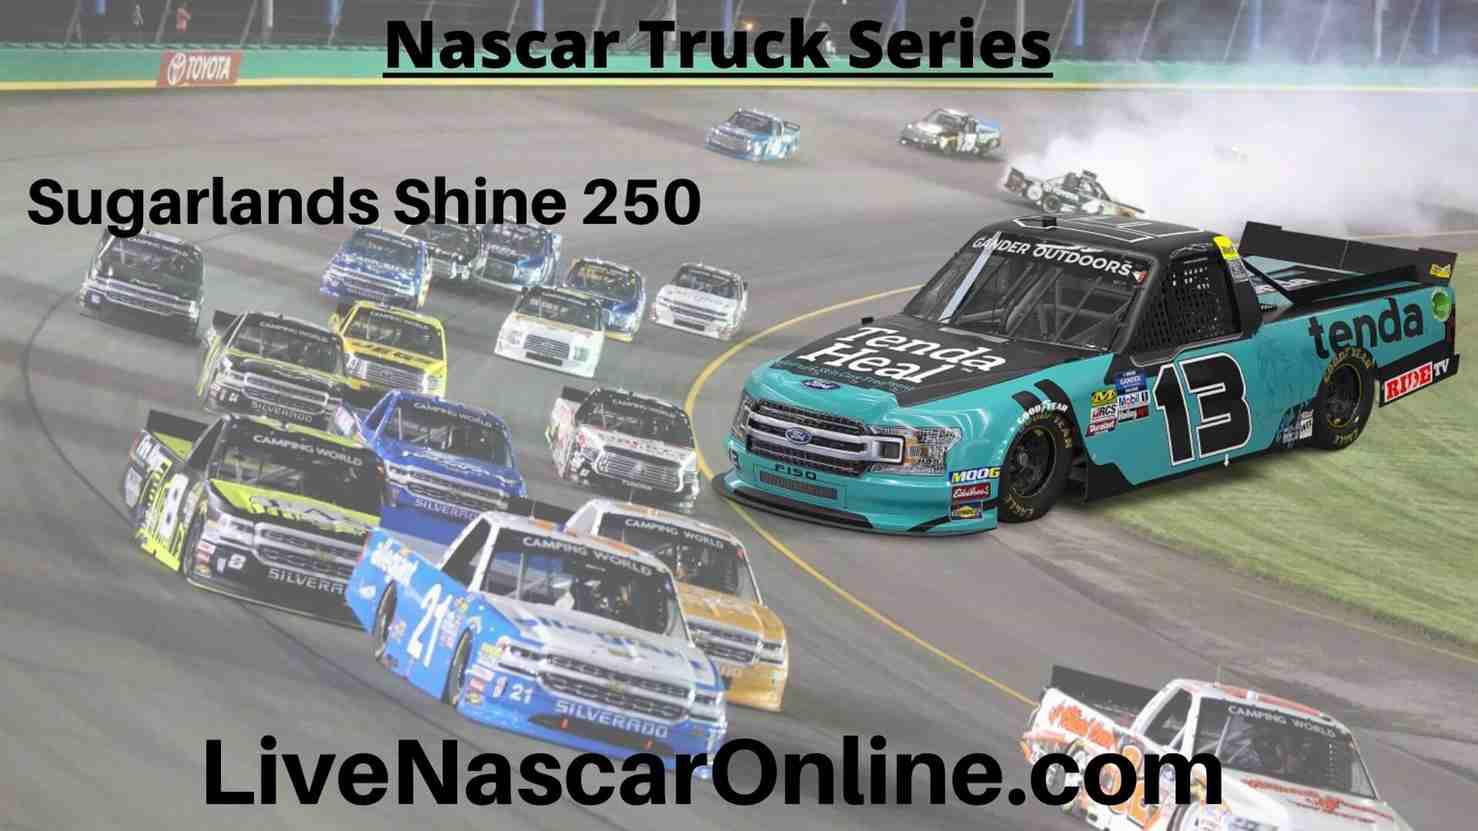 Sugarlands Shine 250 Online Stream | NASCAR Talladega 2020